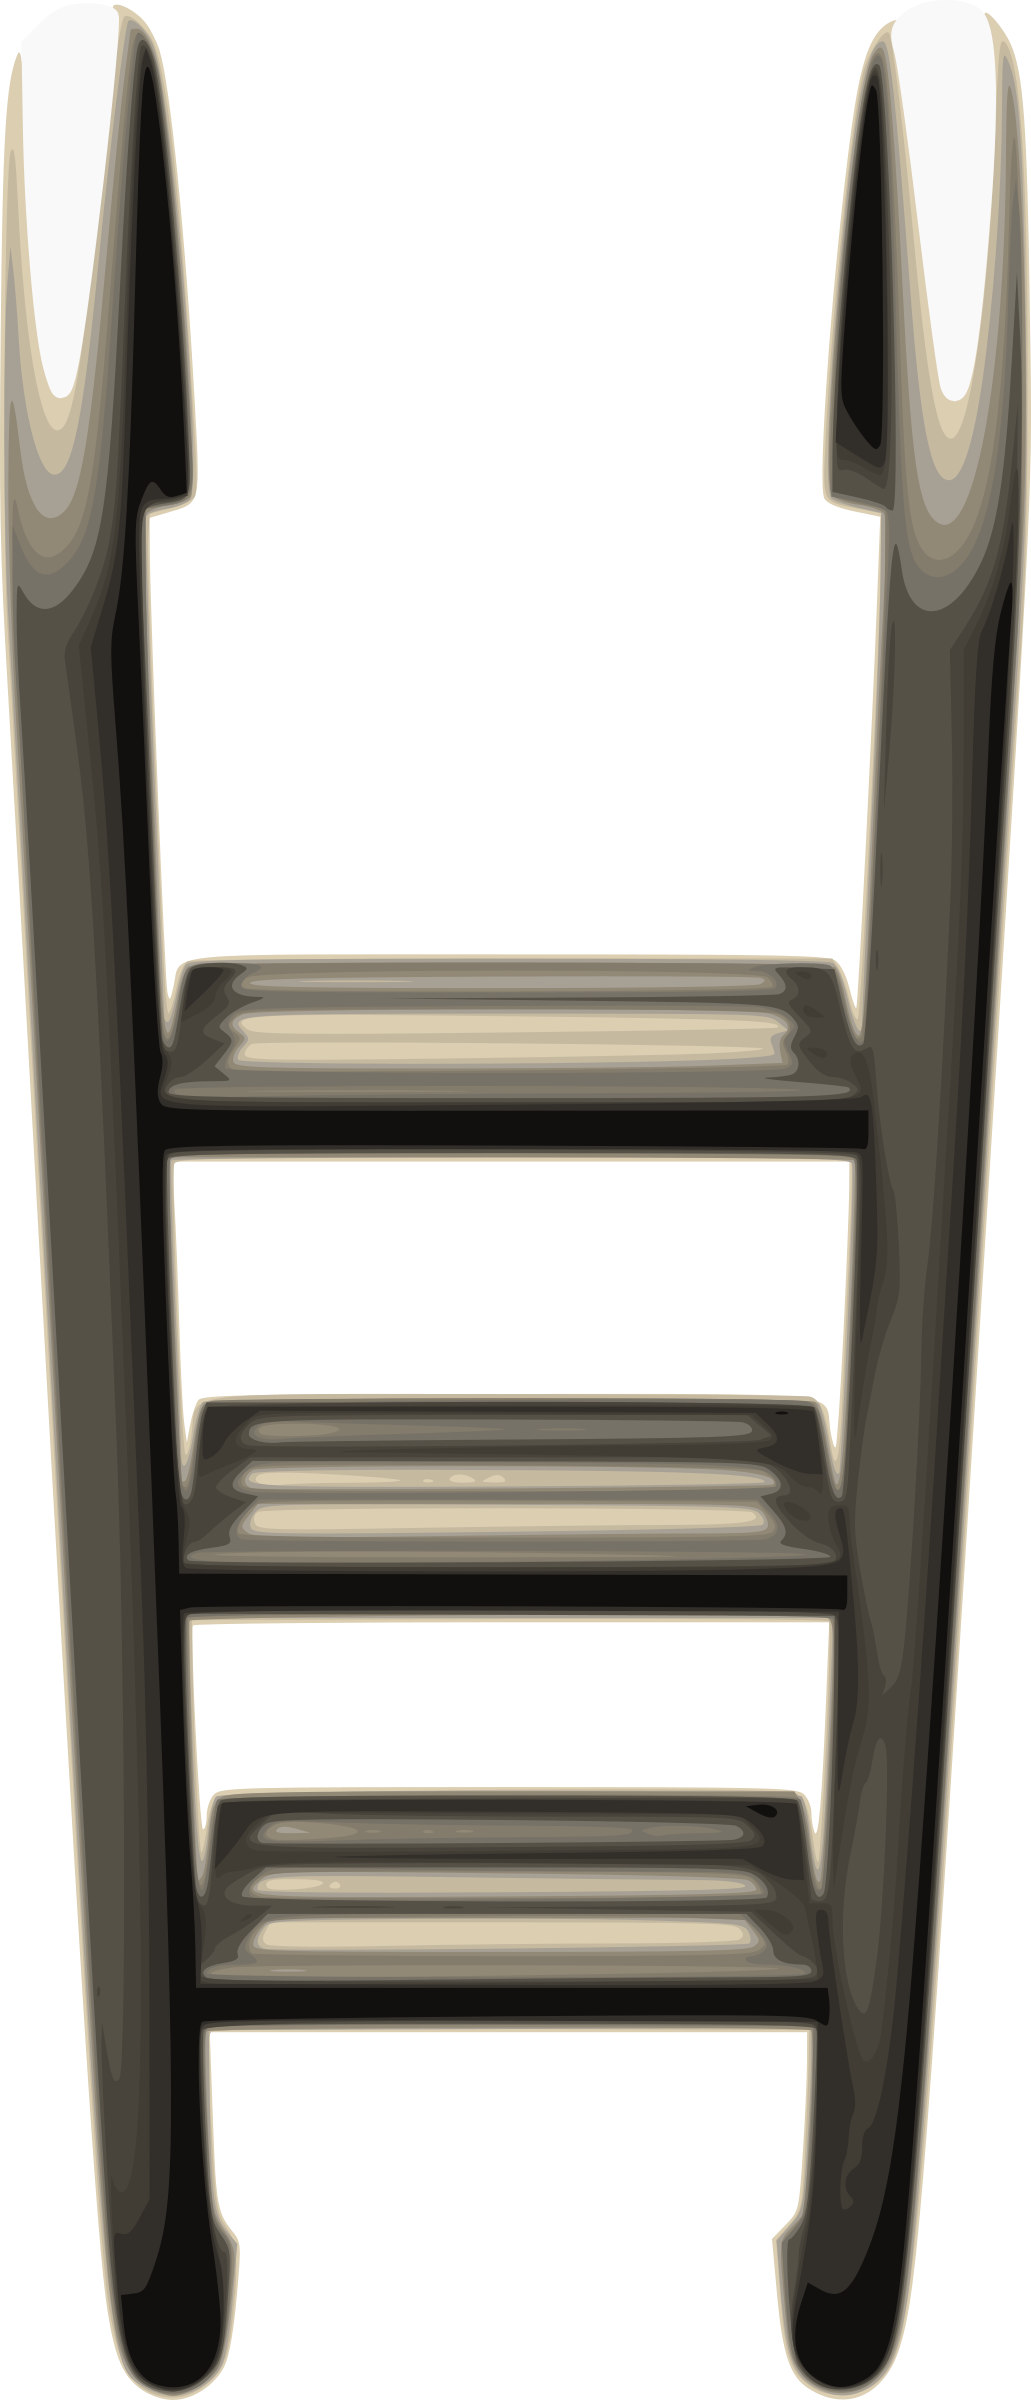 Swimming pool big image. Ladder clipart wood ladder